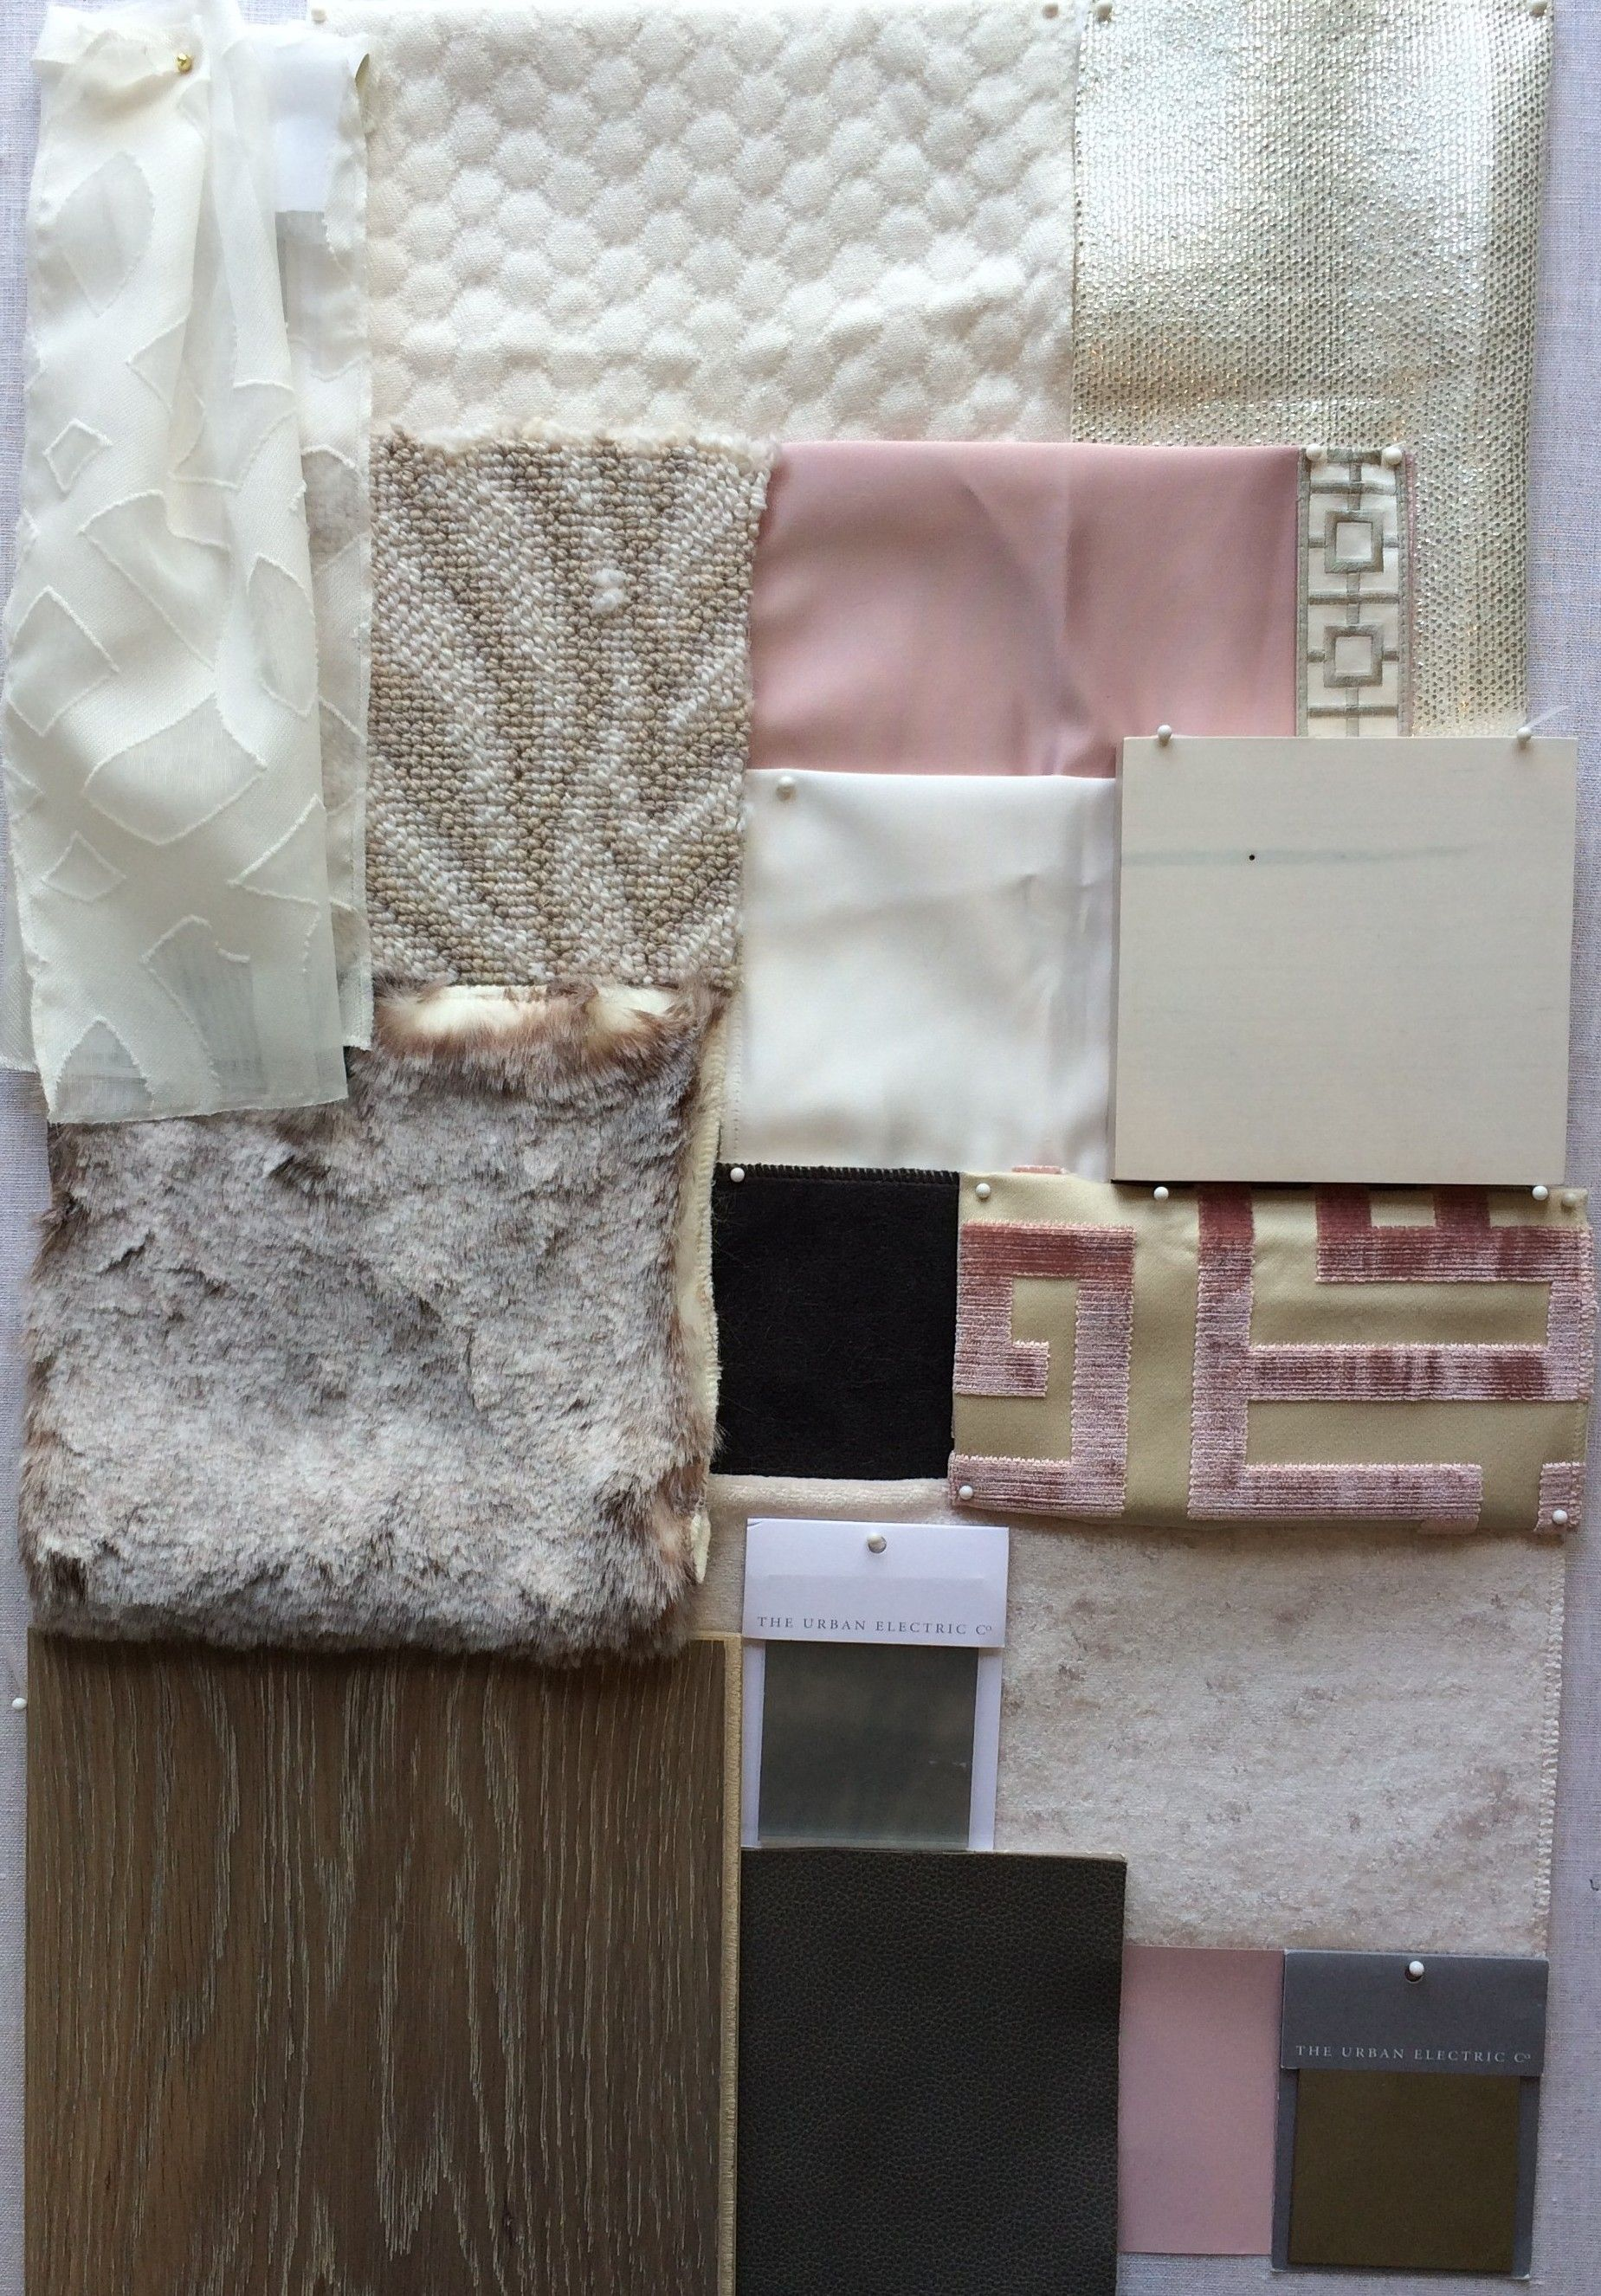 Kul interiors blush bedroom color palate color pop pinterest